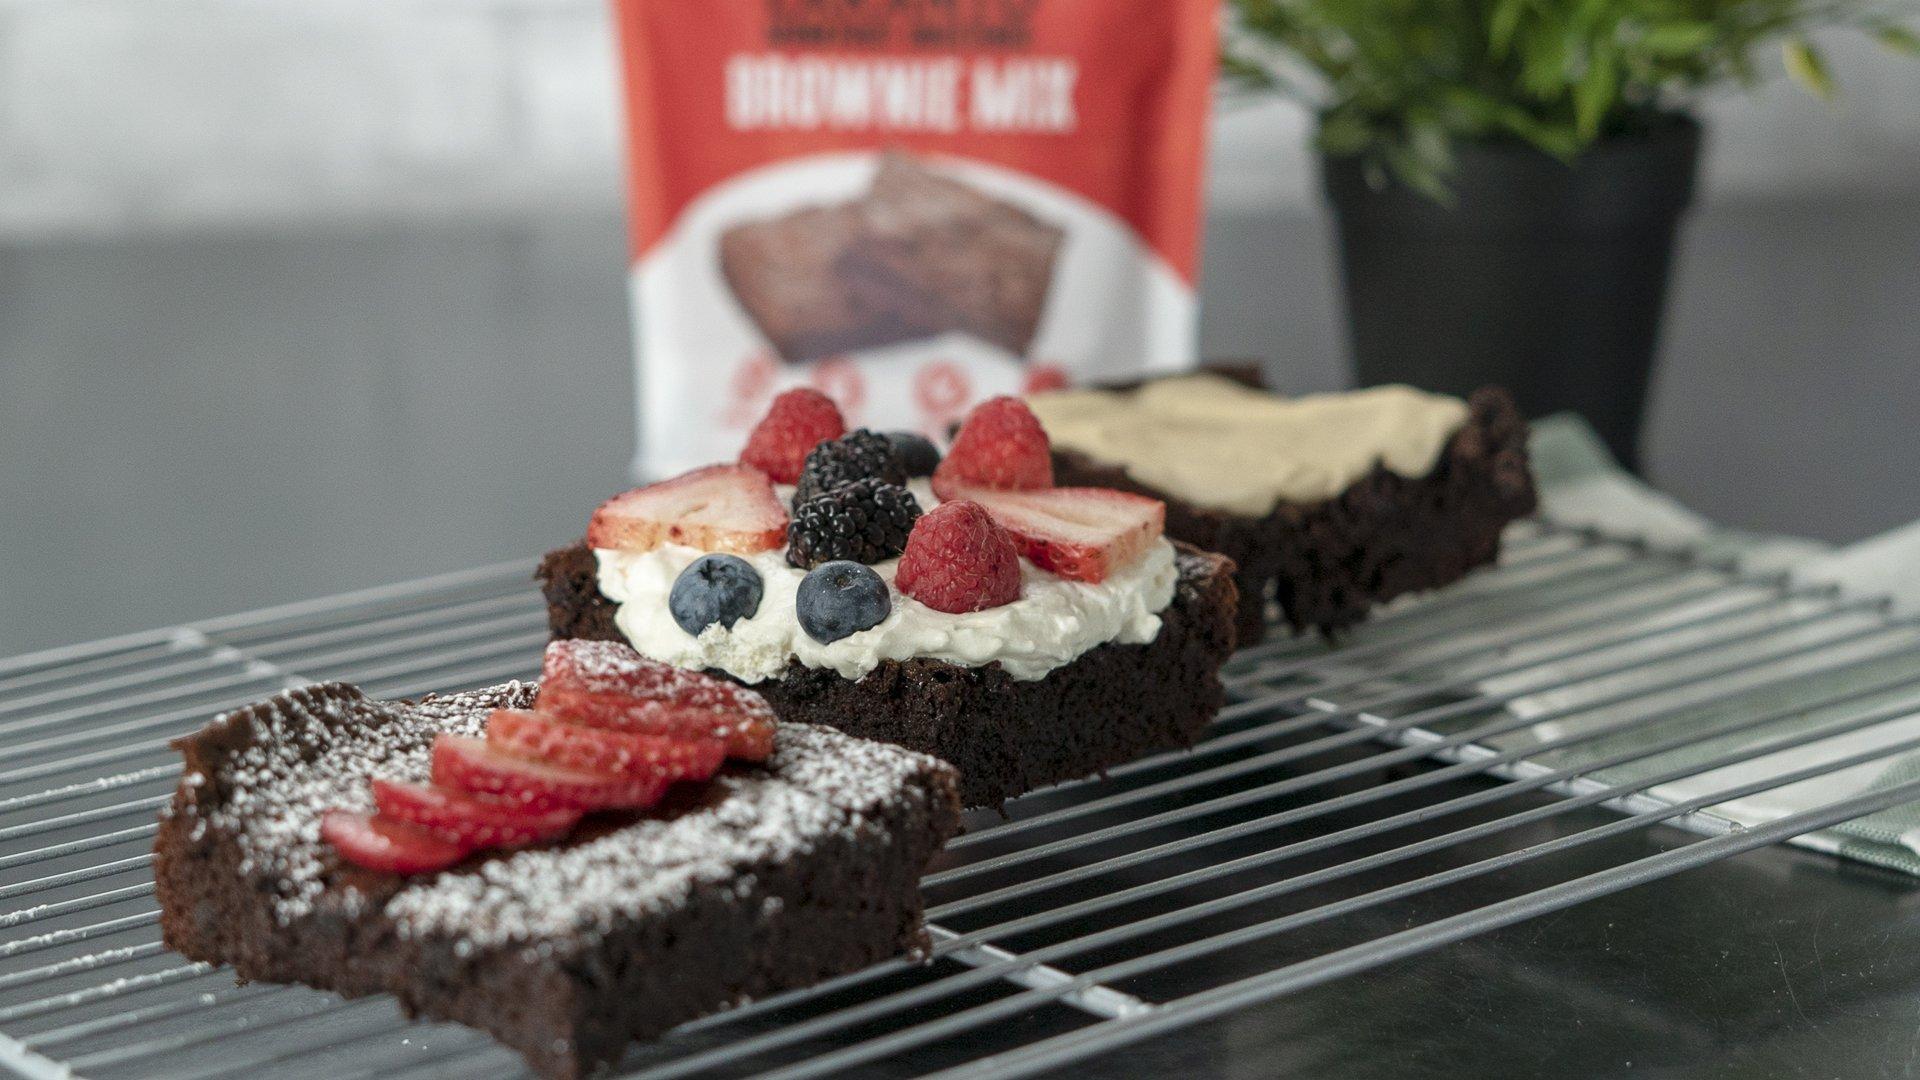 Lakanto Sugar-Free Brownie Mix | 3 net carbs | (Gluten-Free, 16 Servings) by Lakanto (Image #5)